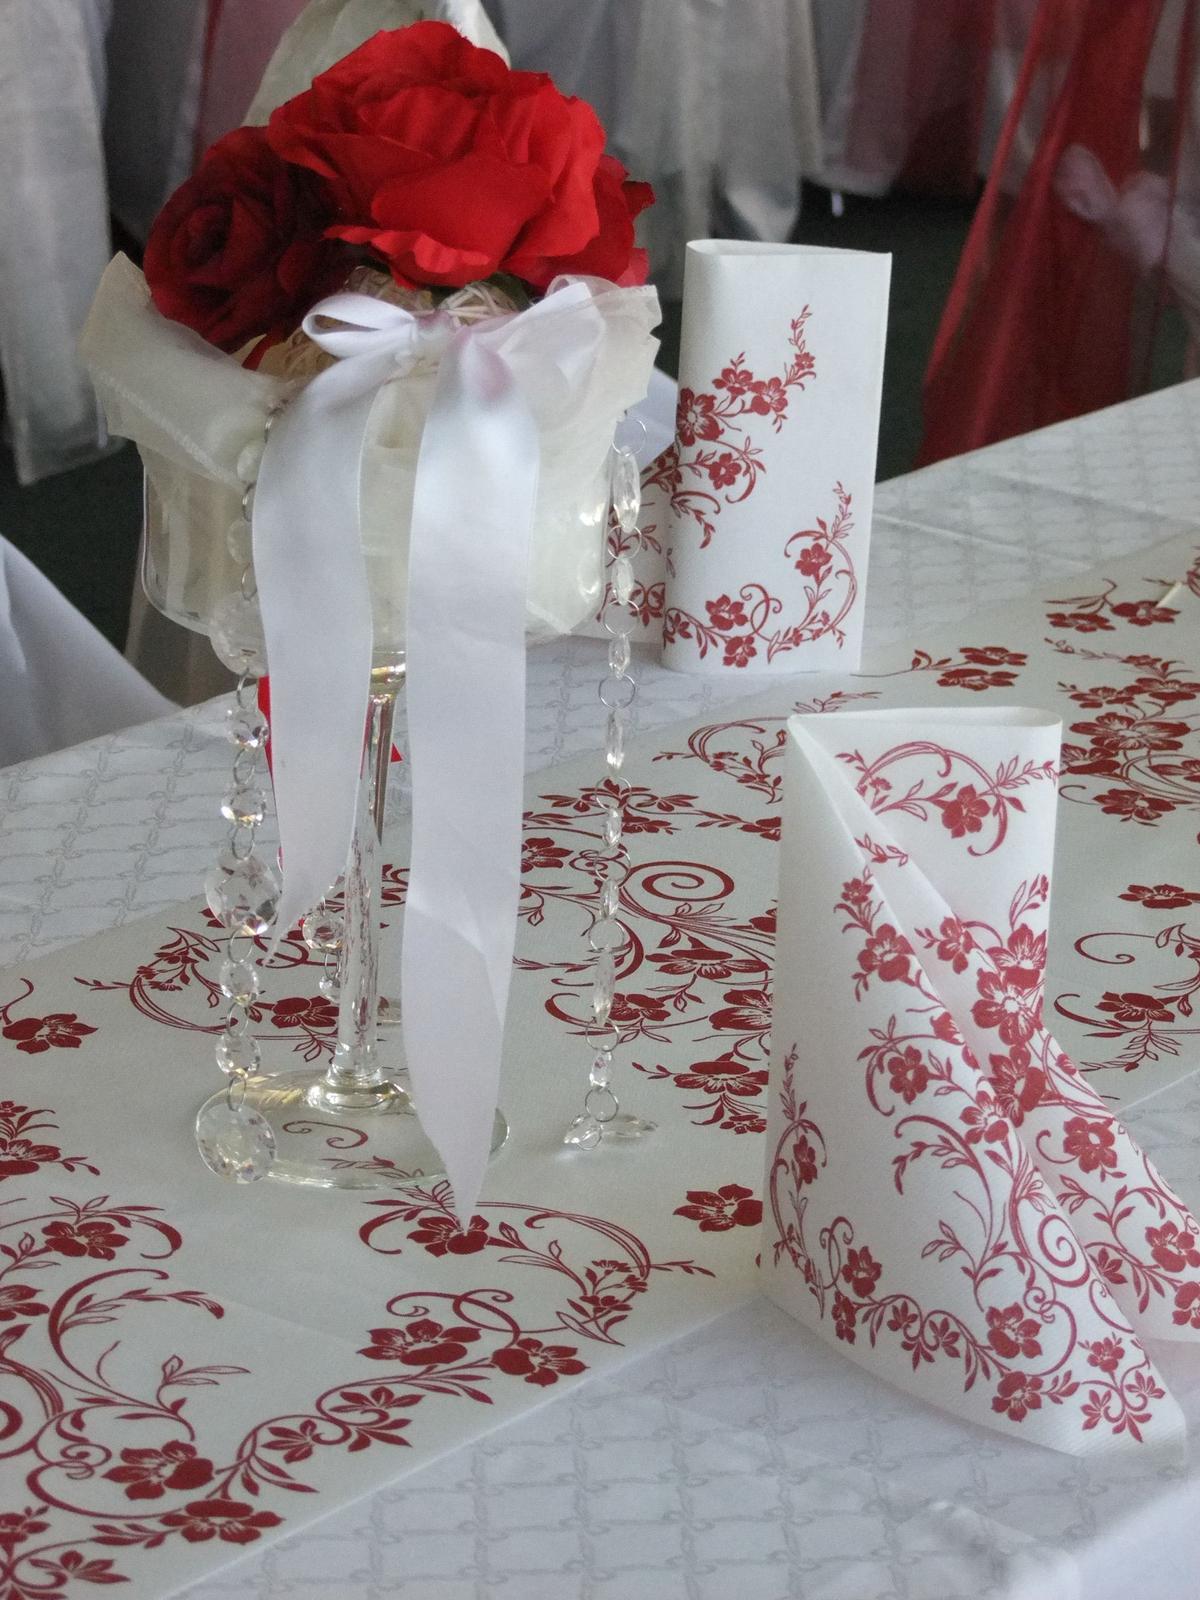 Nové svadobné výzdoby Svadobné centrum Valentíny - Obrázok č. 8